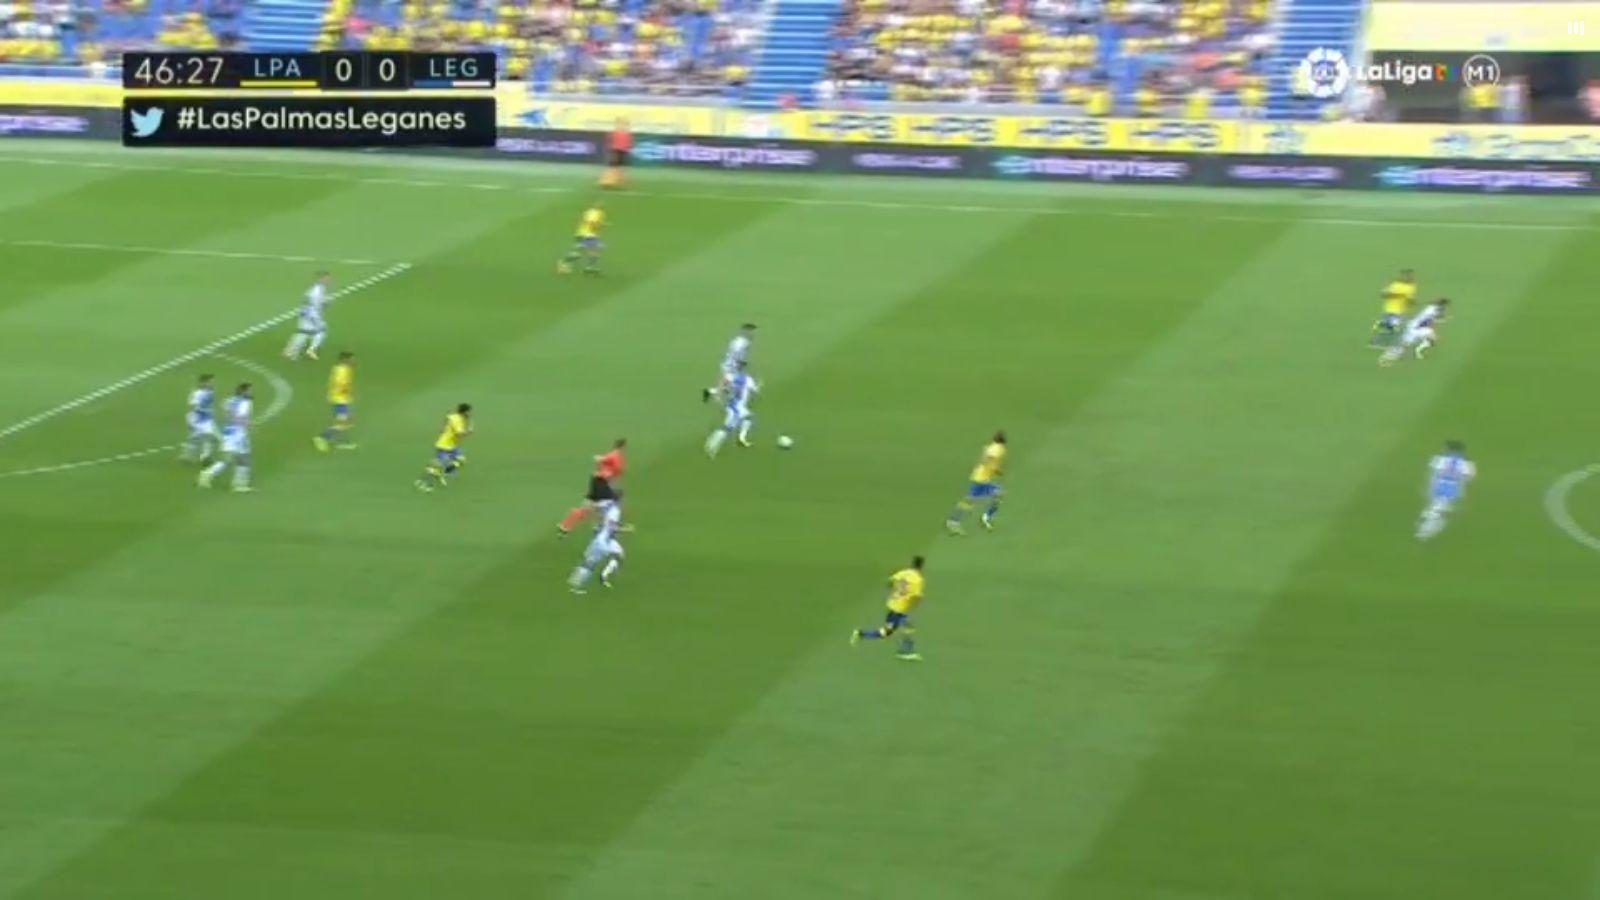 24-09-2017 - Las Palmas 0-2 Leganes